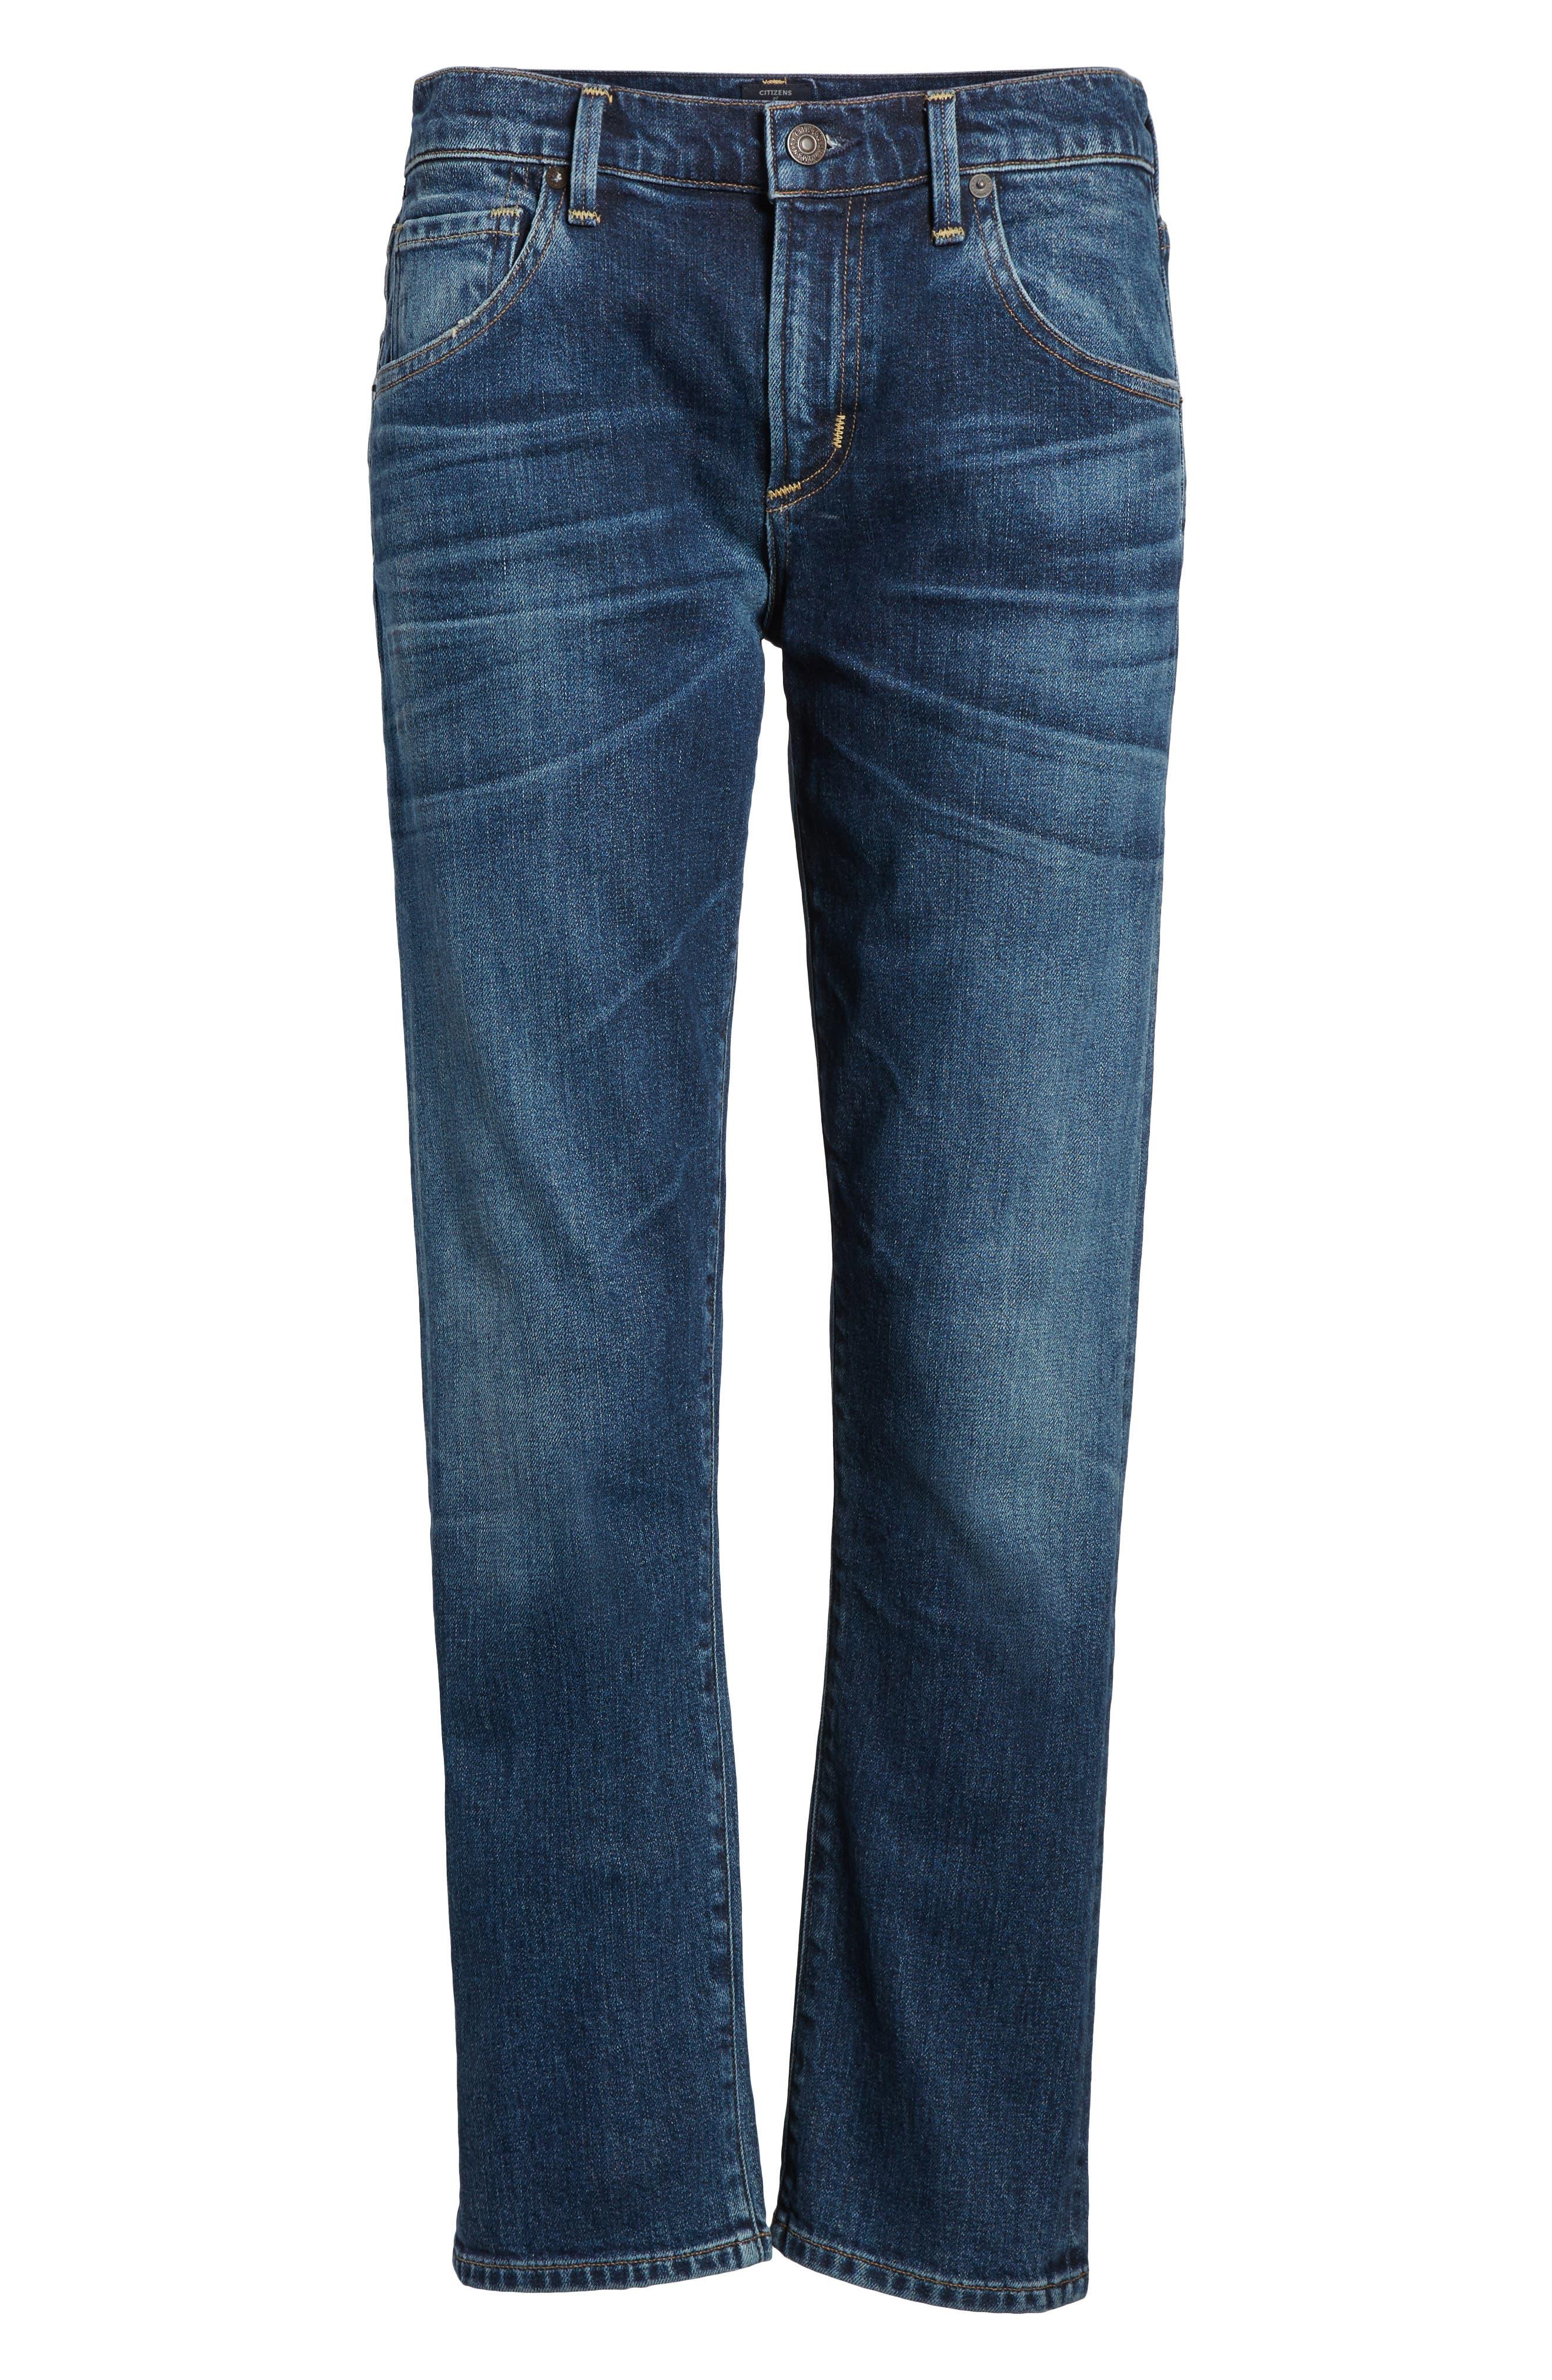 Emerson Slim Boyfriend Jeans,                             Alternate thumbnail 7, color,                             New Moon